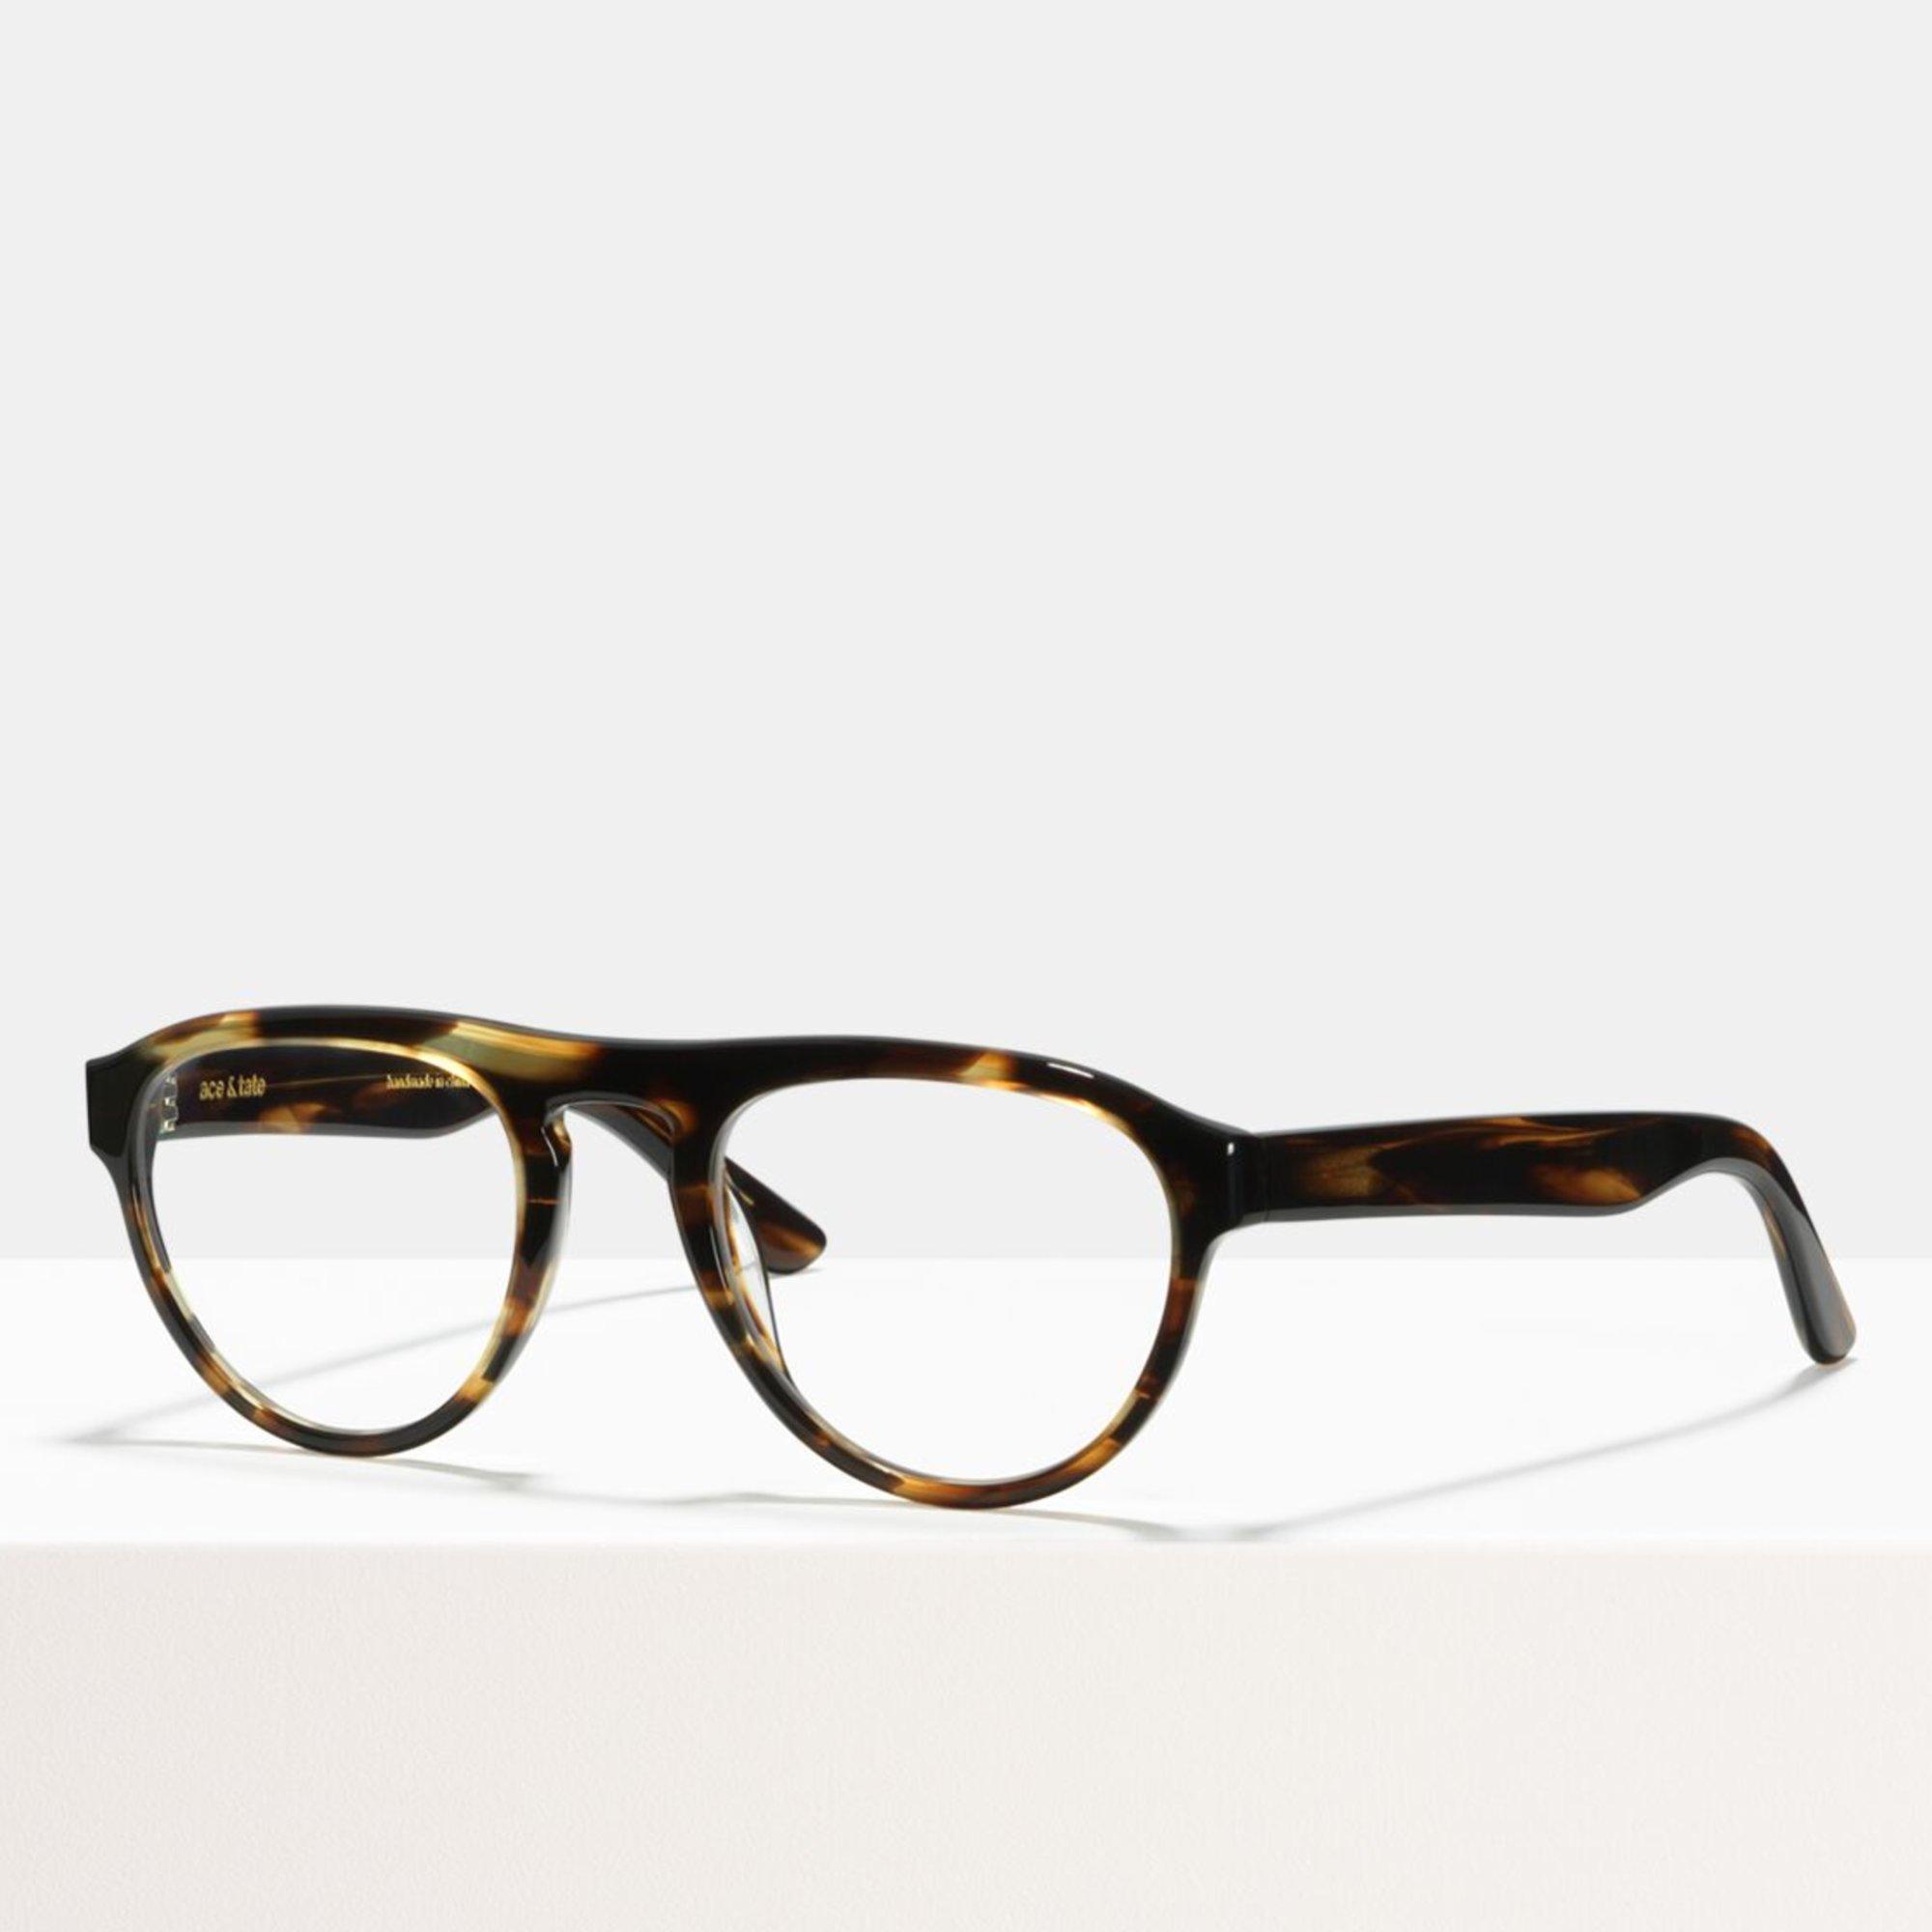 Ace & Tate Glasses |  acetate in Brown, Orange